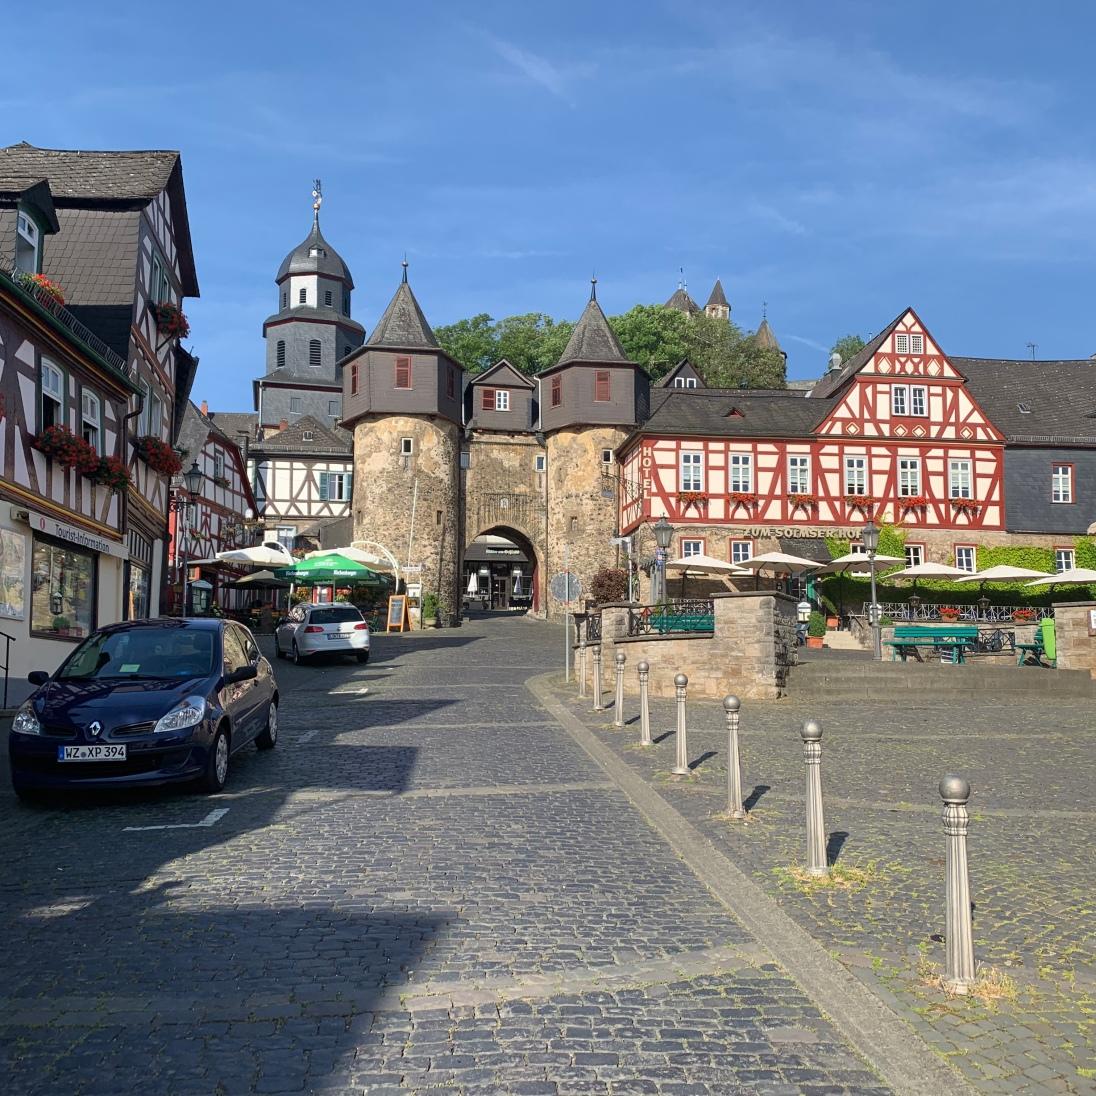 Braunfels - sitting 100m above the Lahn Valley